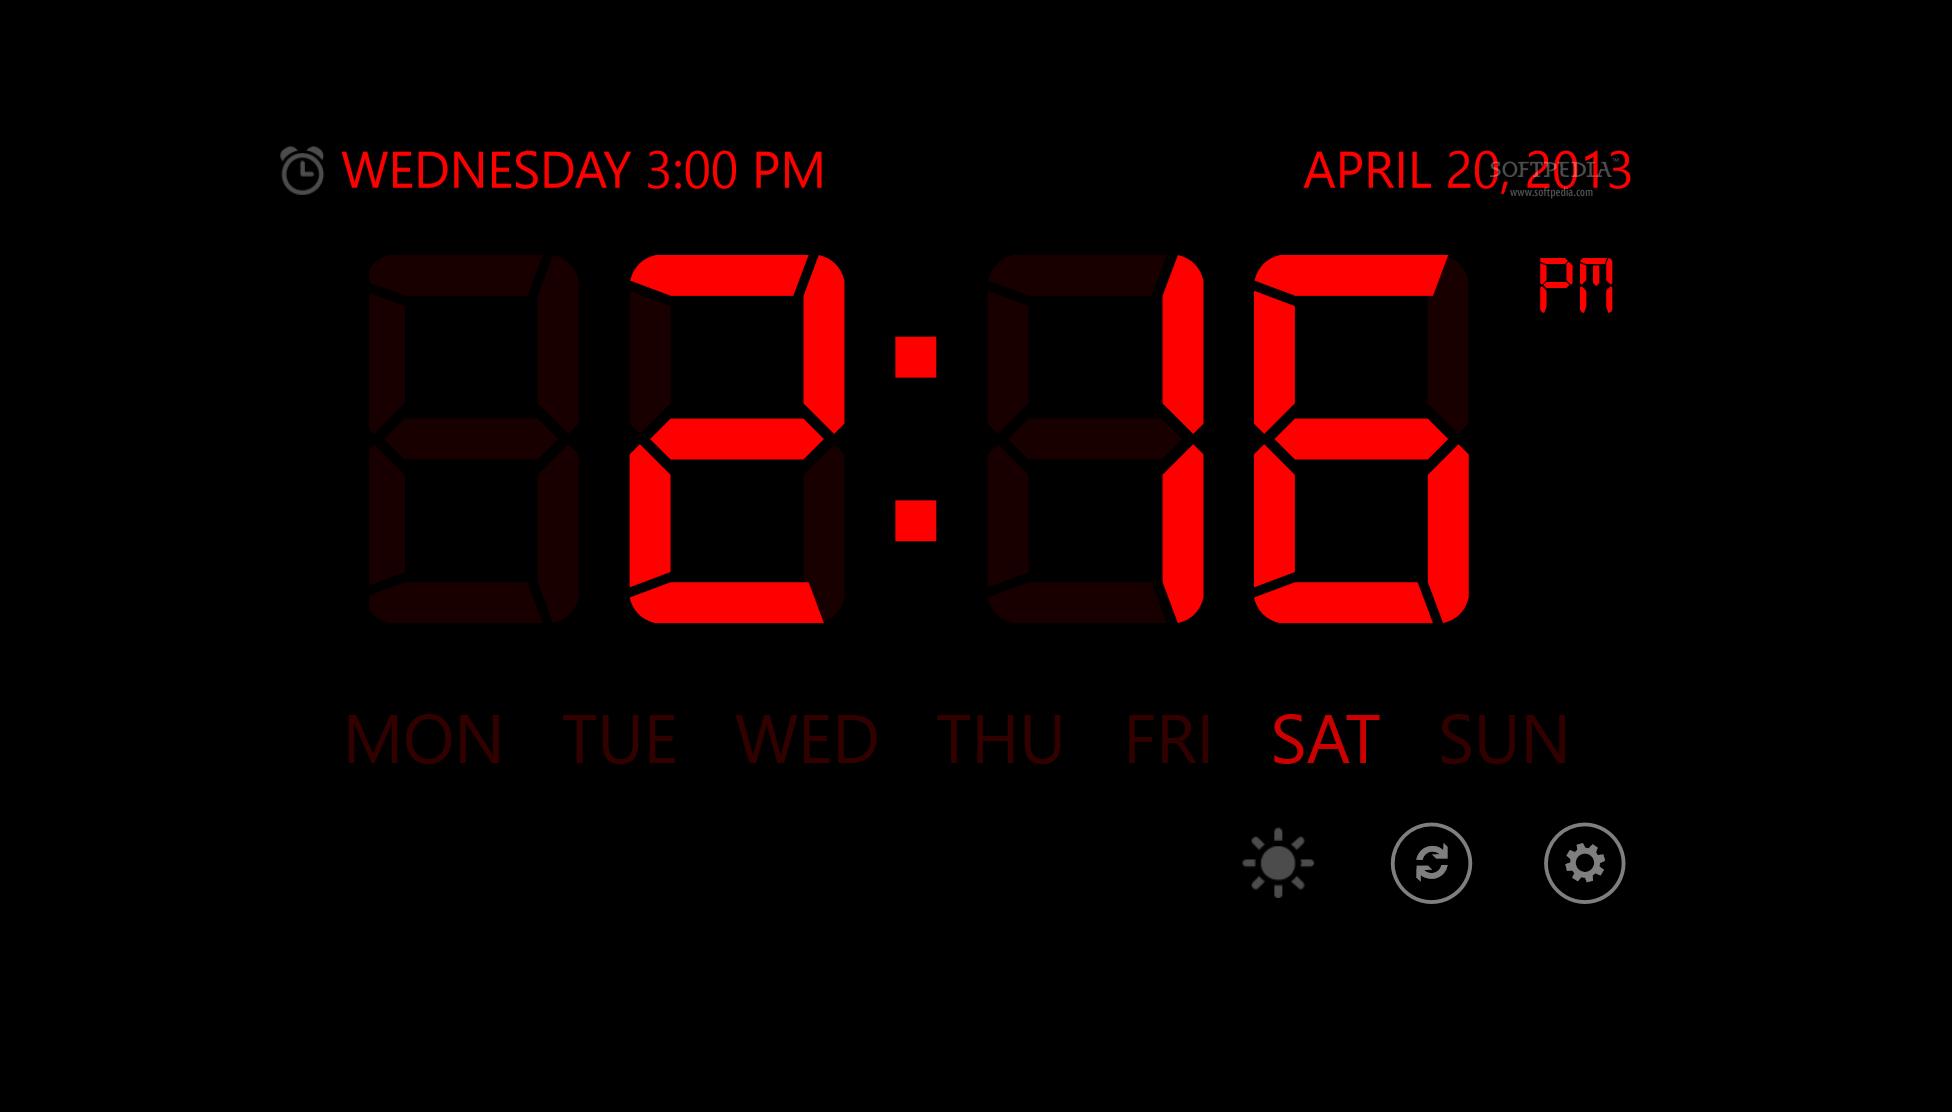 Windows Alarm Clock